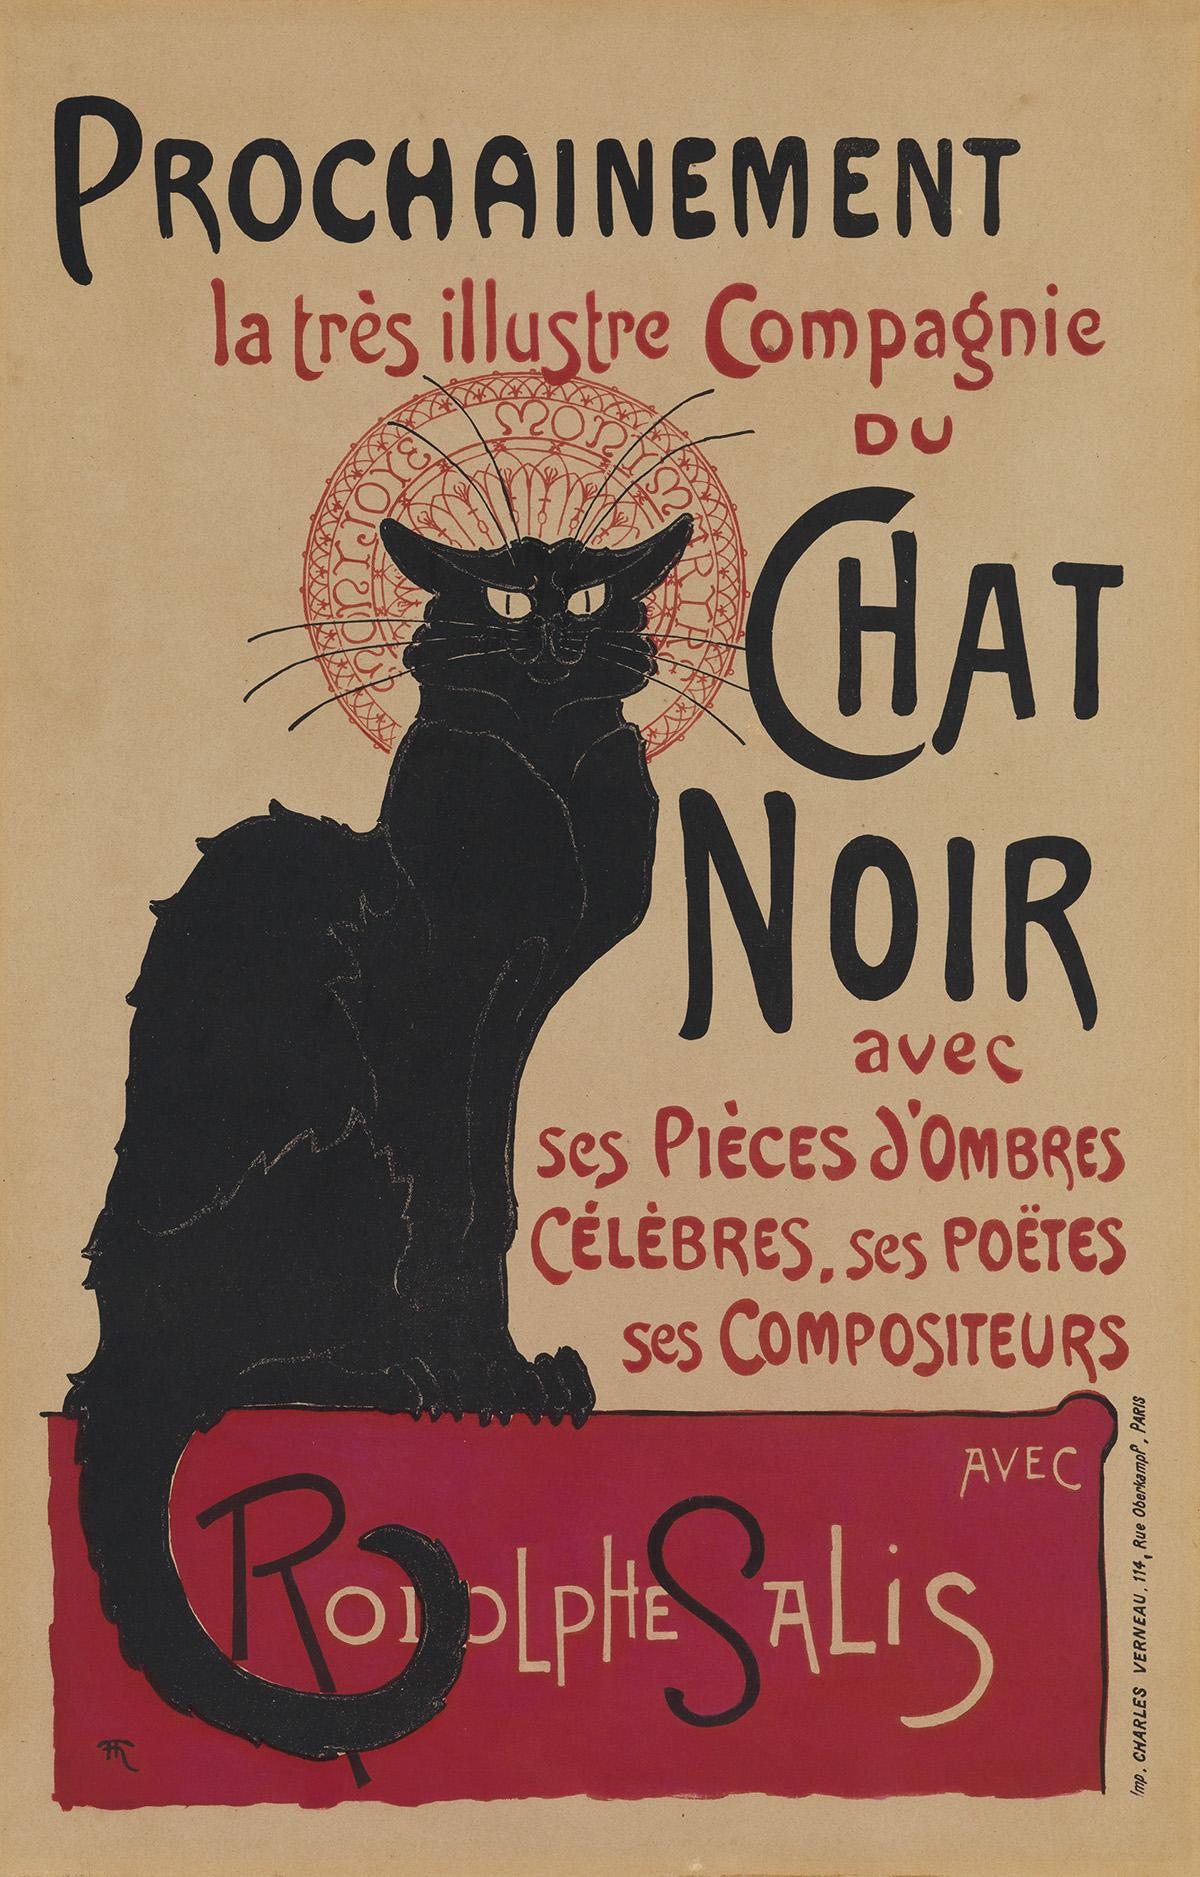 THÉOPHILE-ALEXANDRE STEINLEN (1859-1923). CHAT NOIR. 1896. 24x15 inches, 62x39 cm. Charles Verneau, Paris.